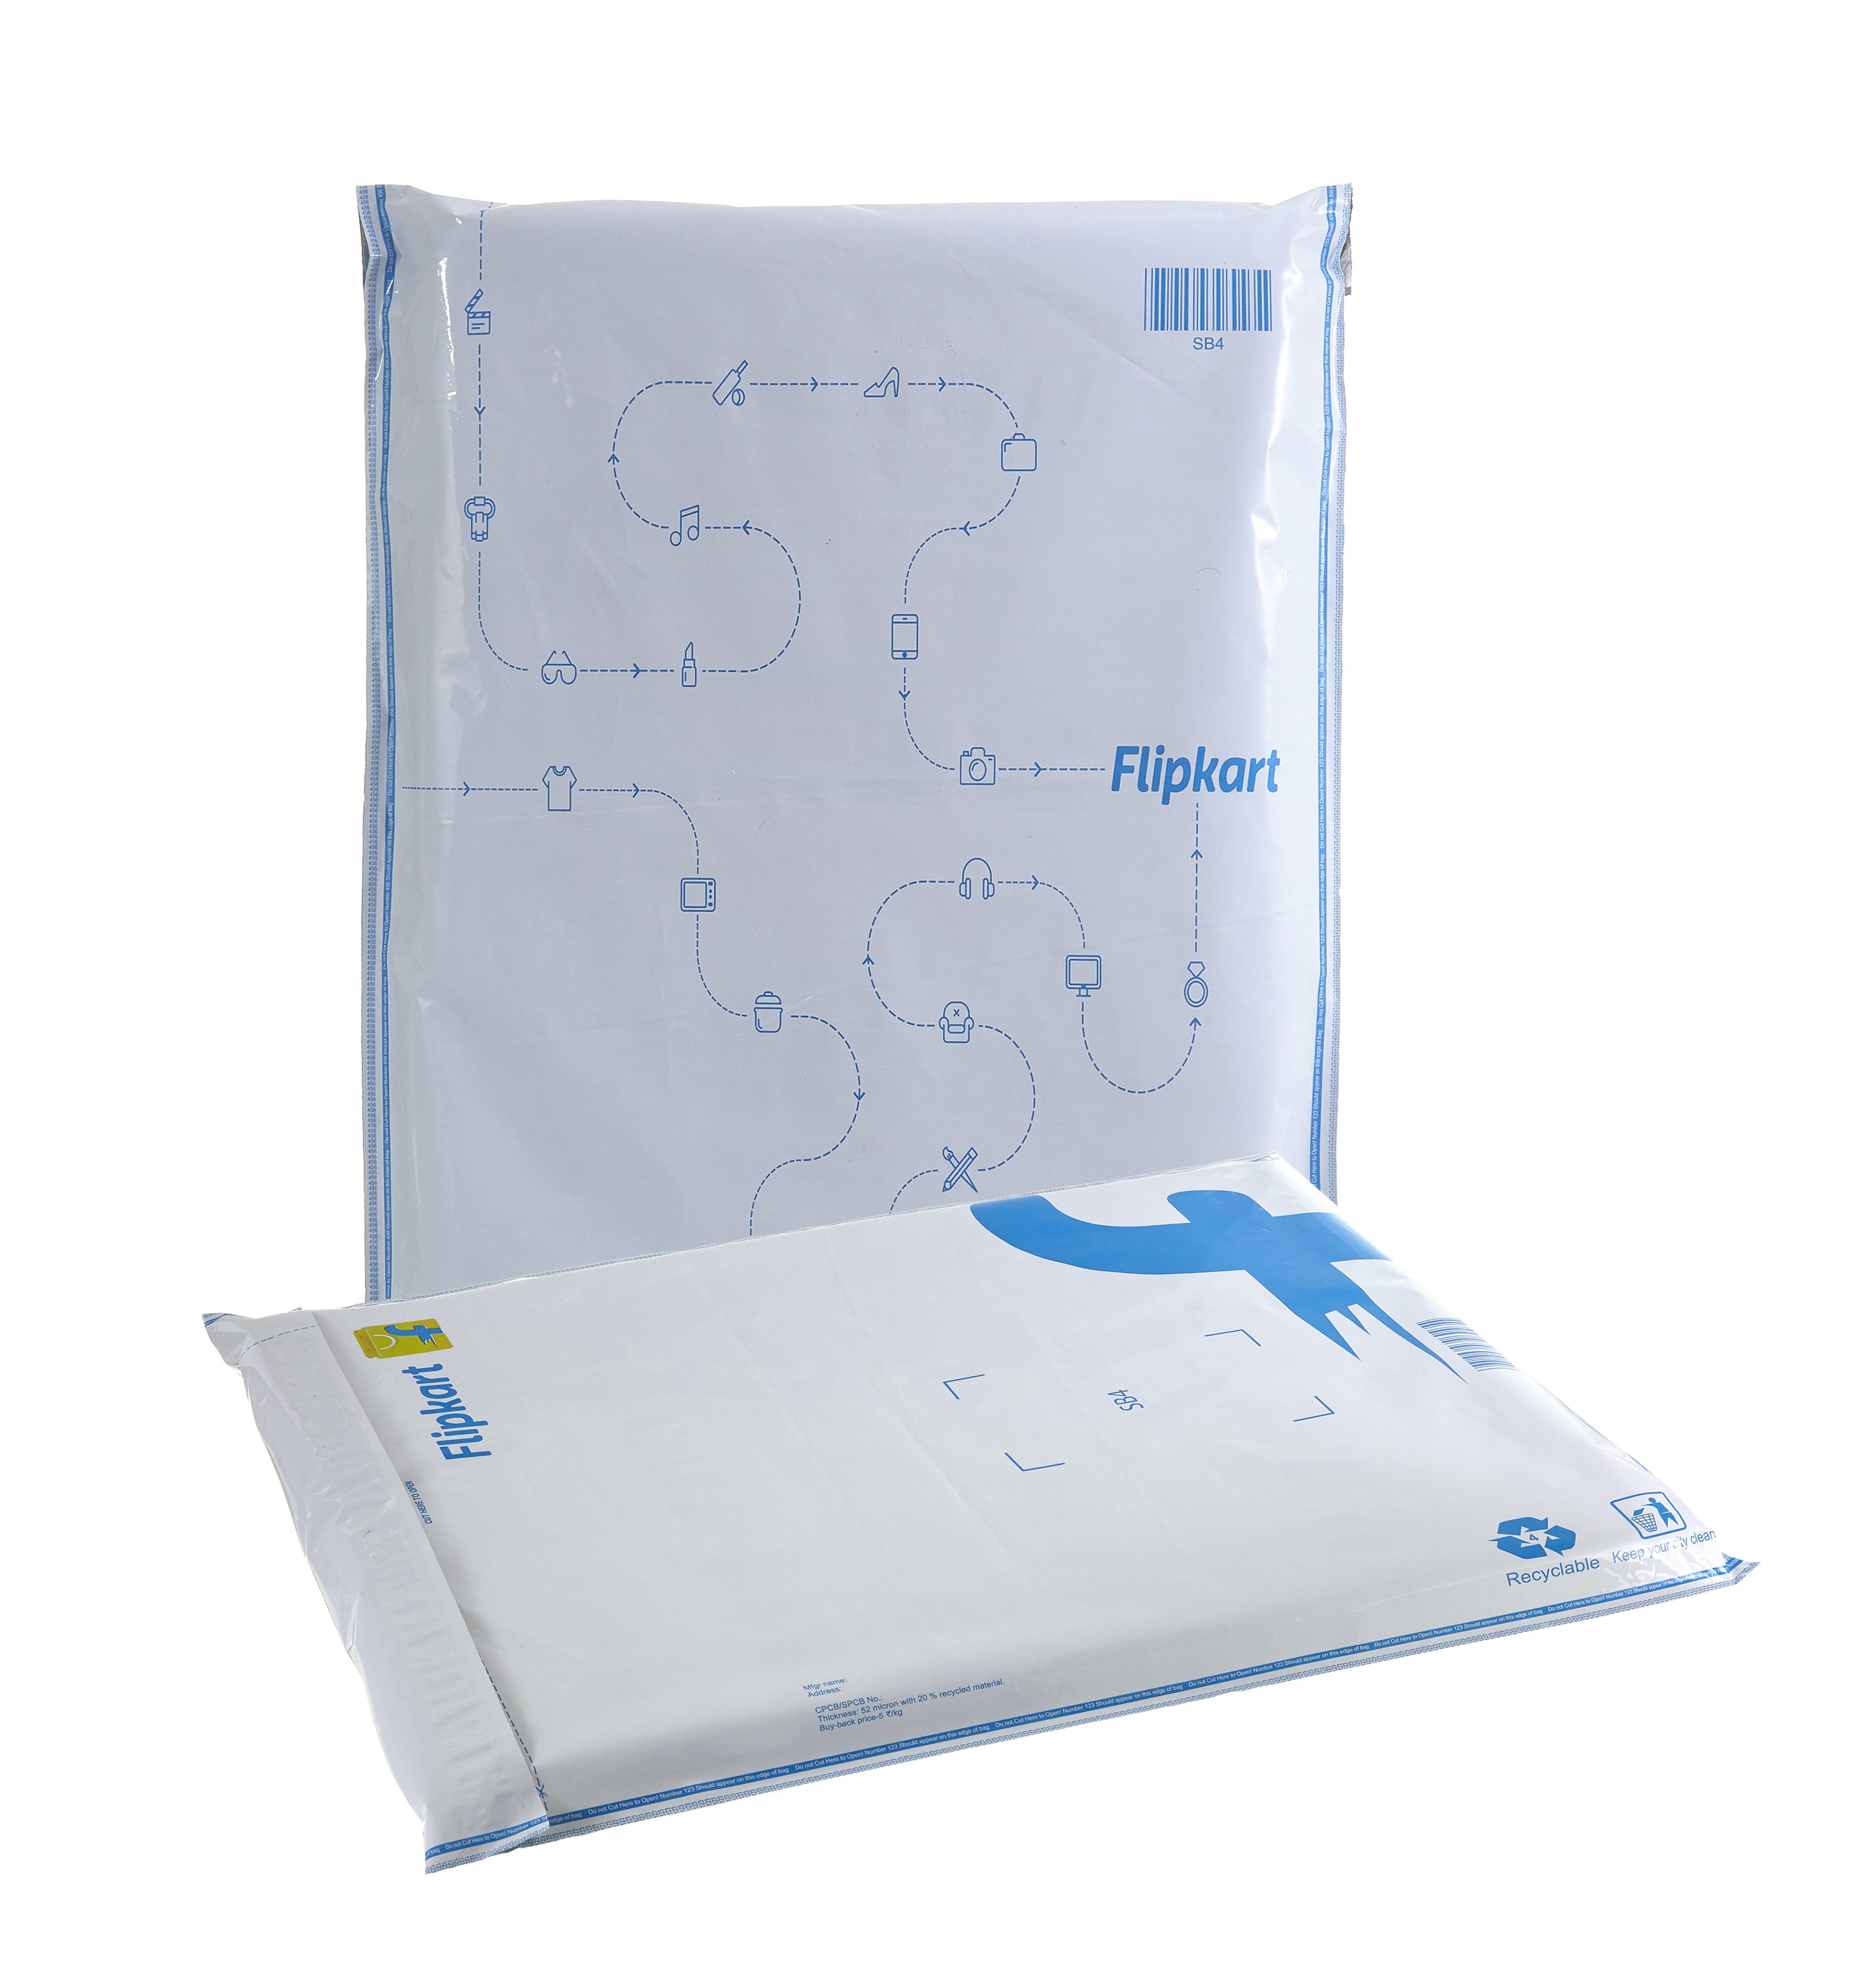 Flipkart Tamper Proof Courier Bags